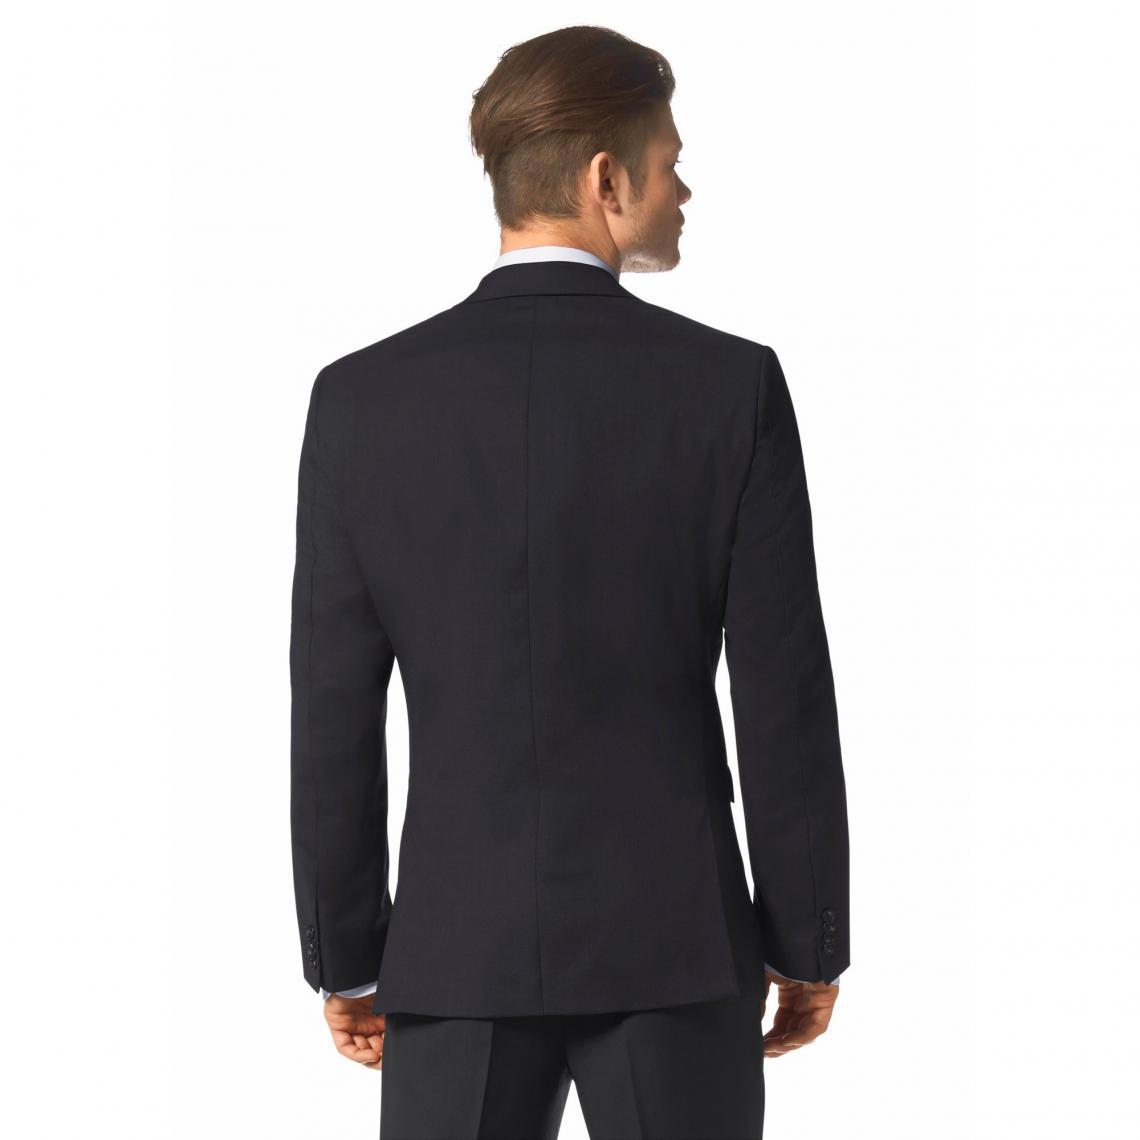 33f51fb89da8 Veste de costume 2 boutons homme Montana Bruno Banani - Gris